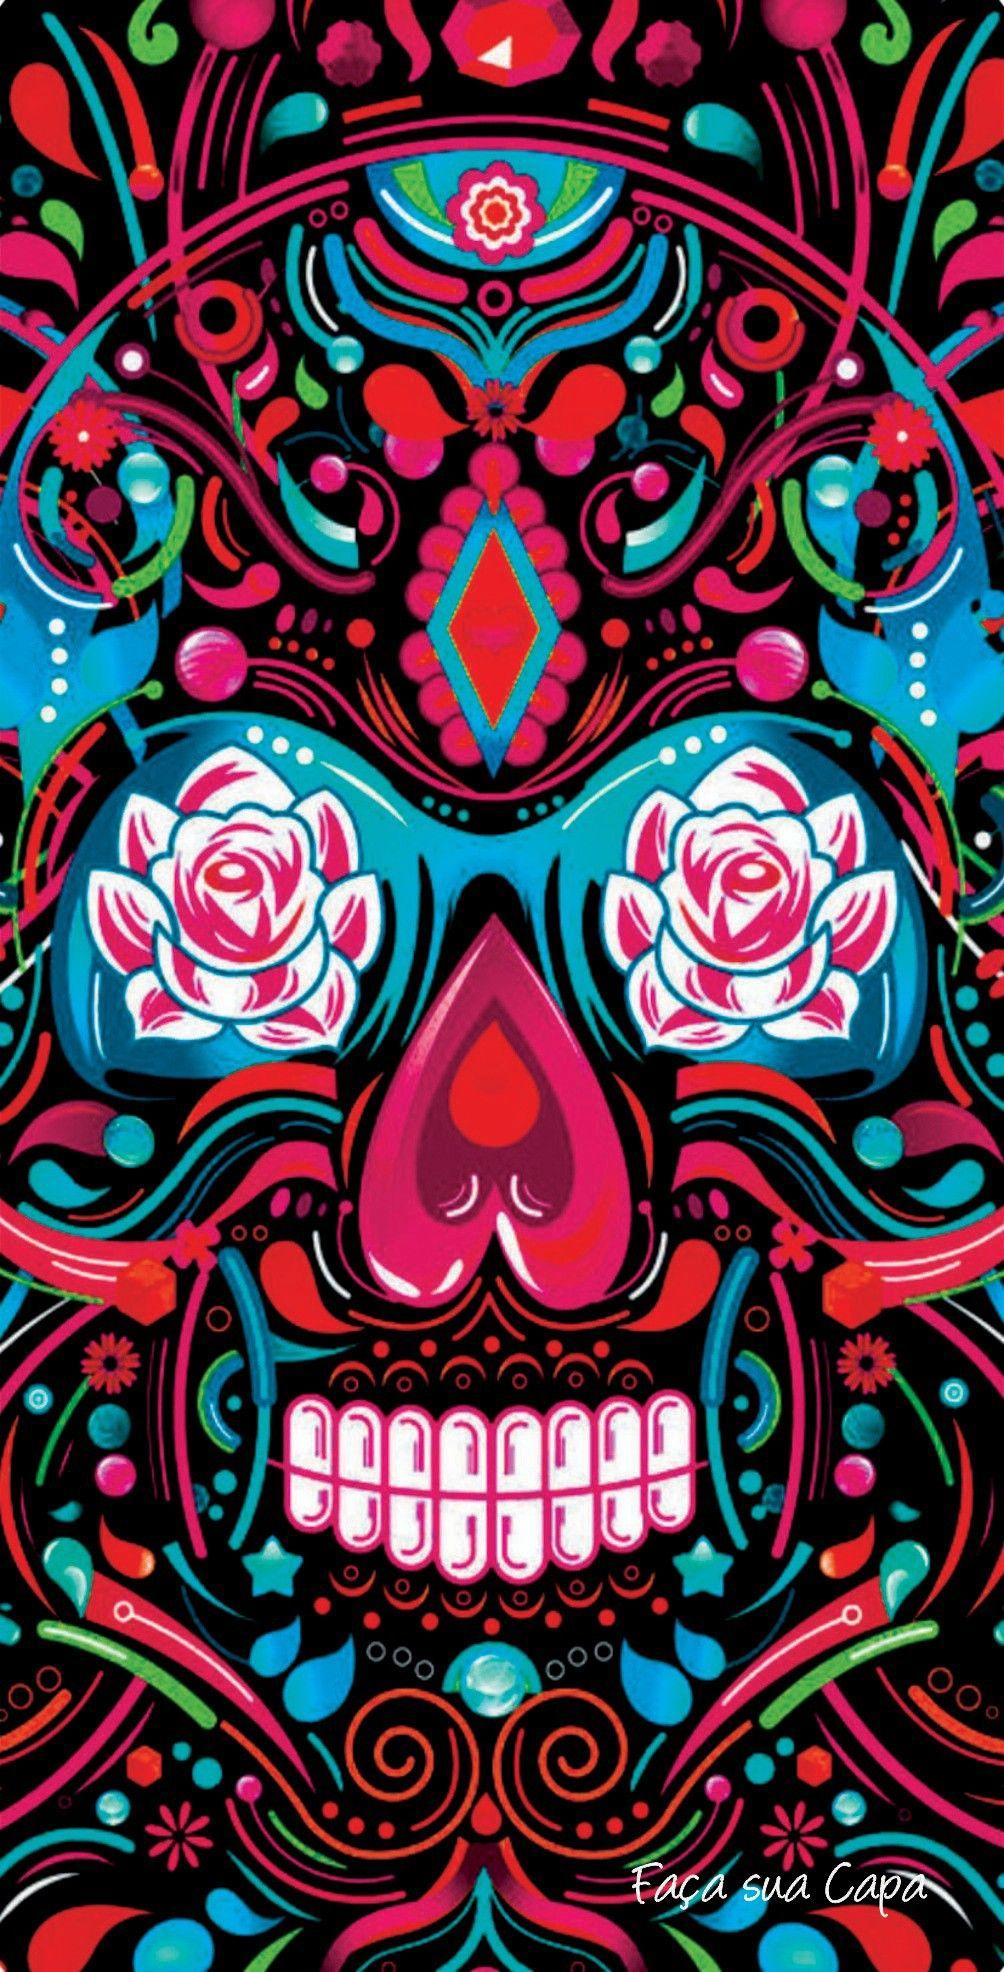 Pin by Jelly Bean on wallpaper Skull wallpaper, Pop art